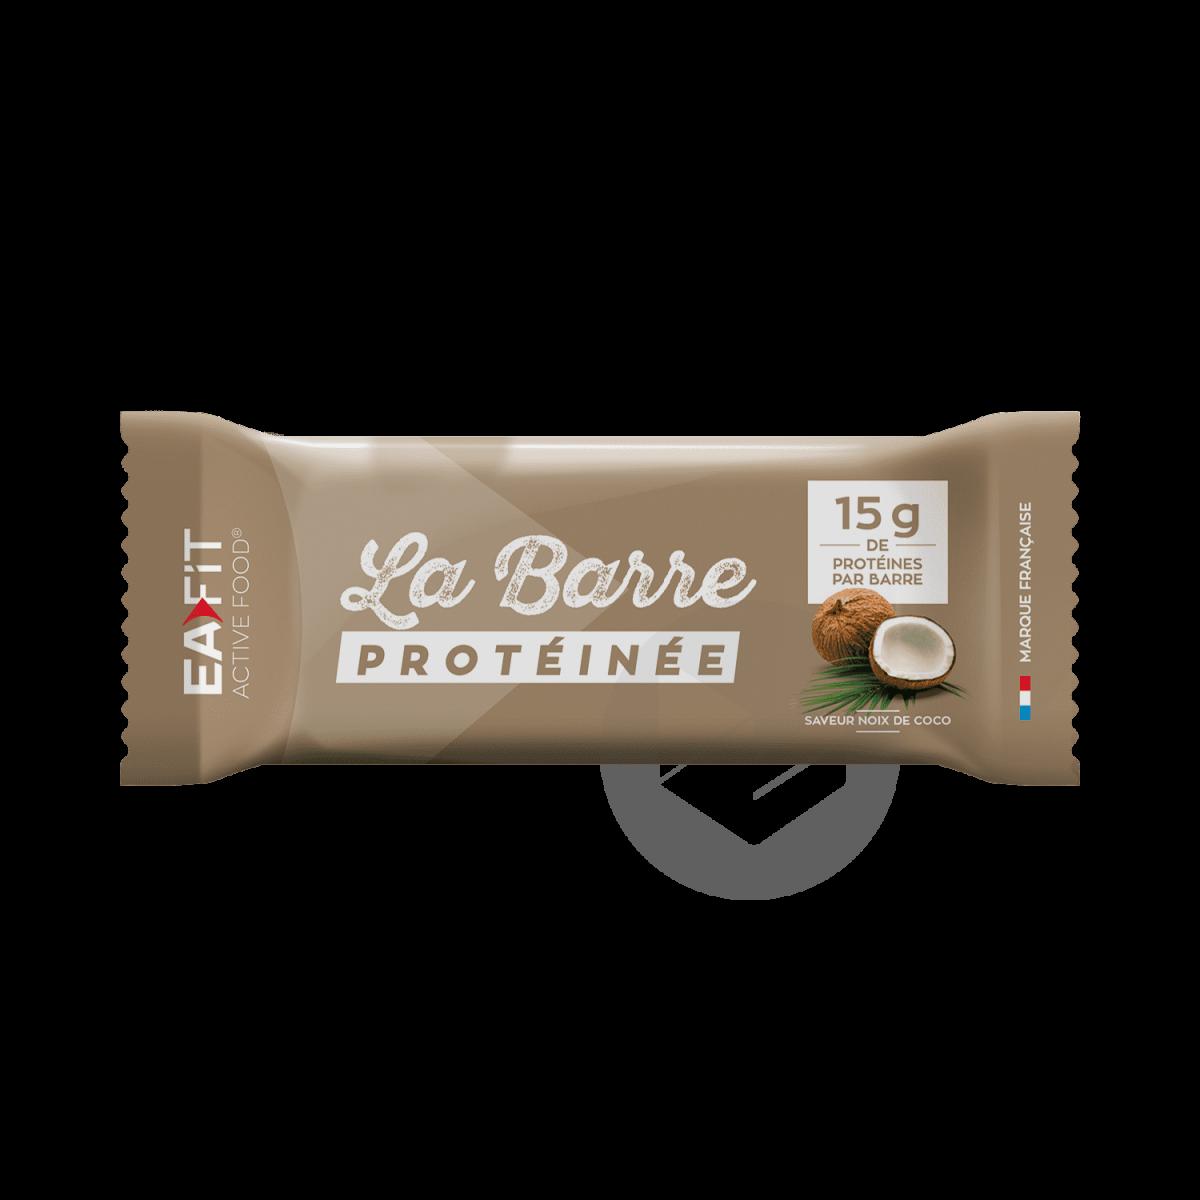 Barre Proteinee Noix De Coco 46 G